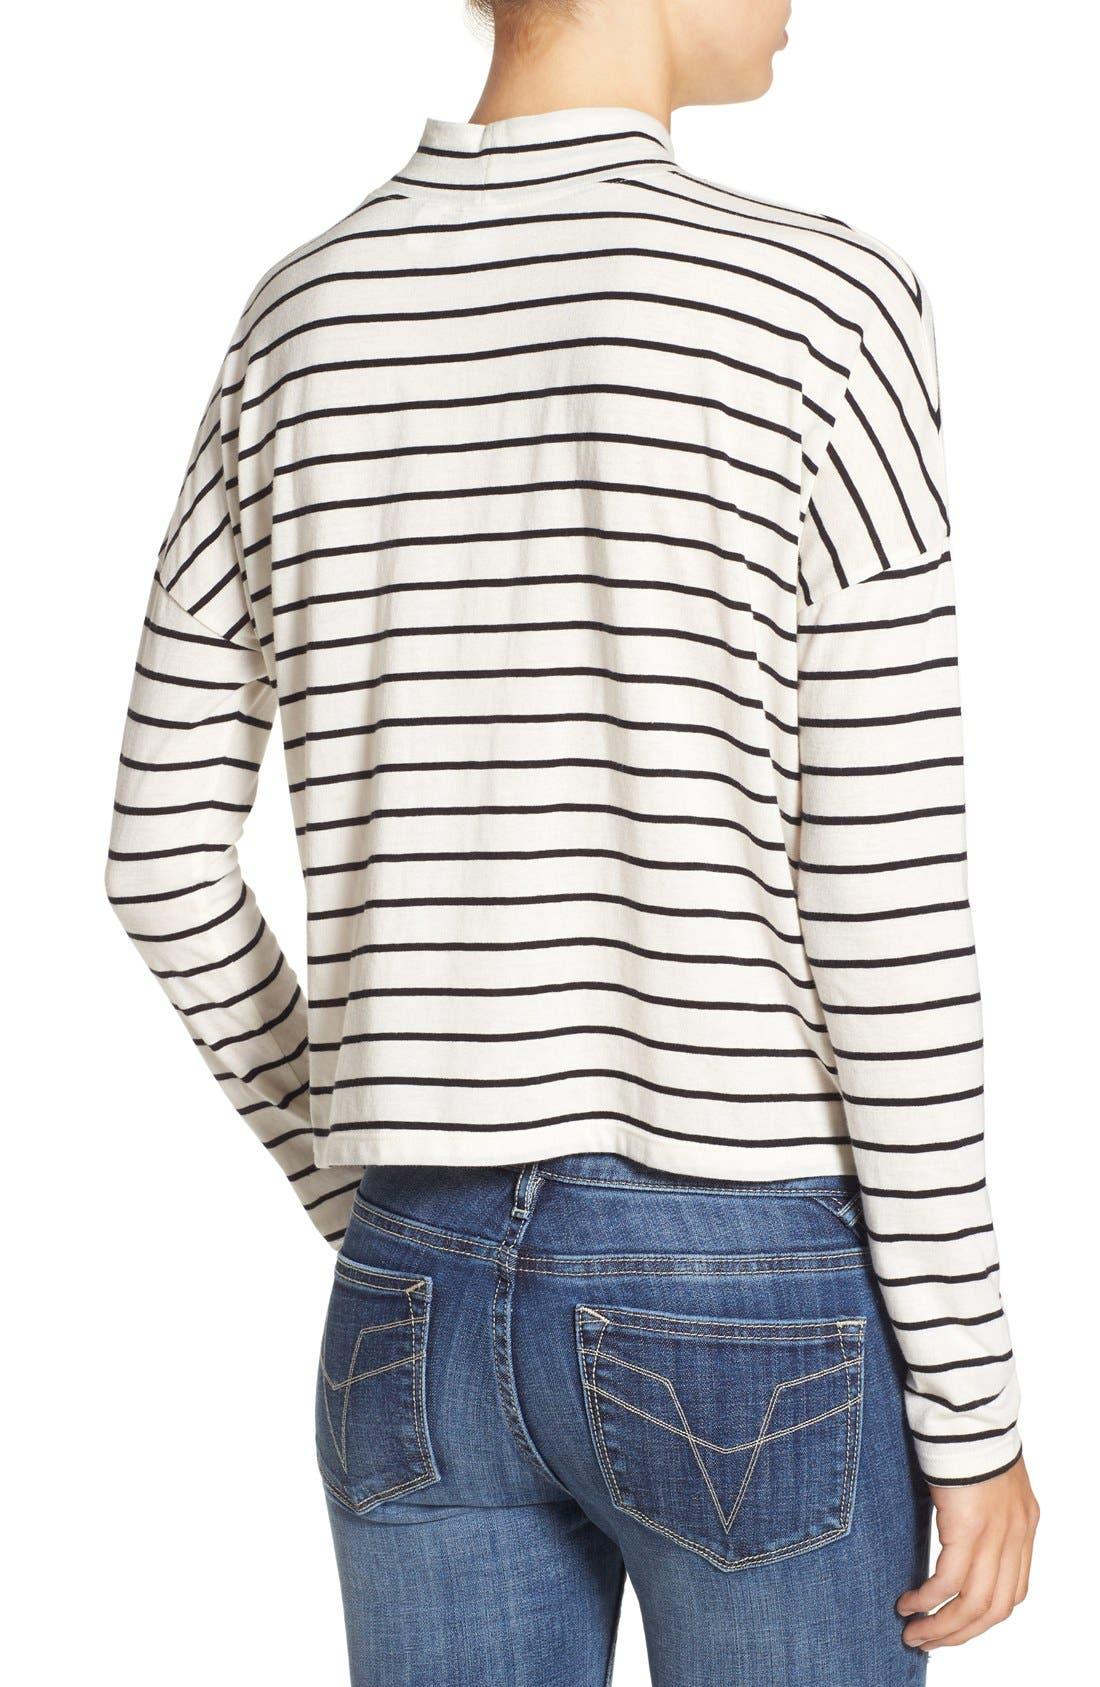 BP., Stripe Long Sleeve Mock Neck Tee, Alternate thumbnail 4, color, 900